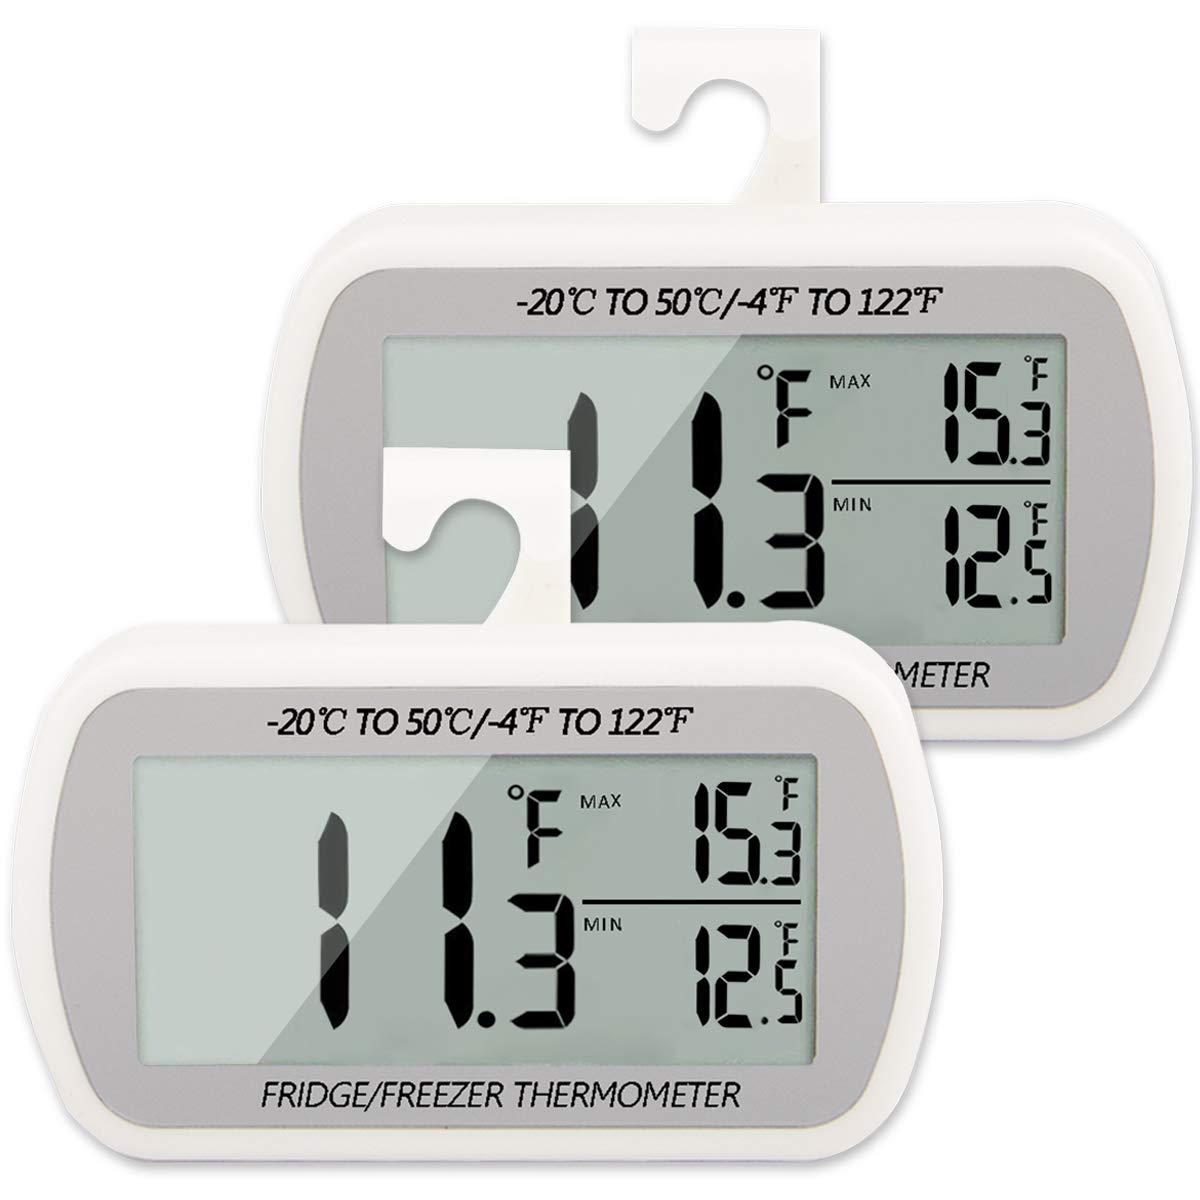 Refrigerator Thermometer 2 Pack Digital Fridge Freezer Room Thermometer Hanging